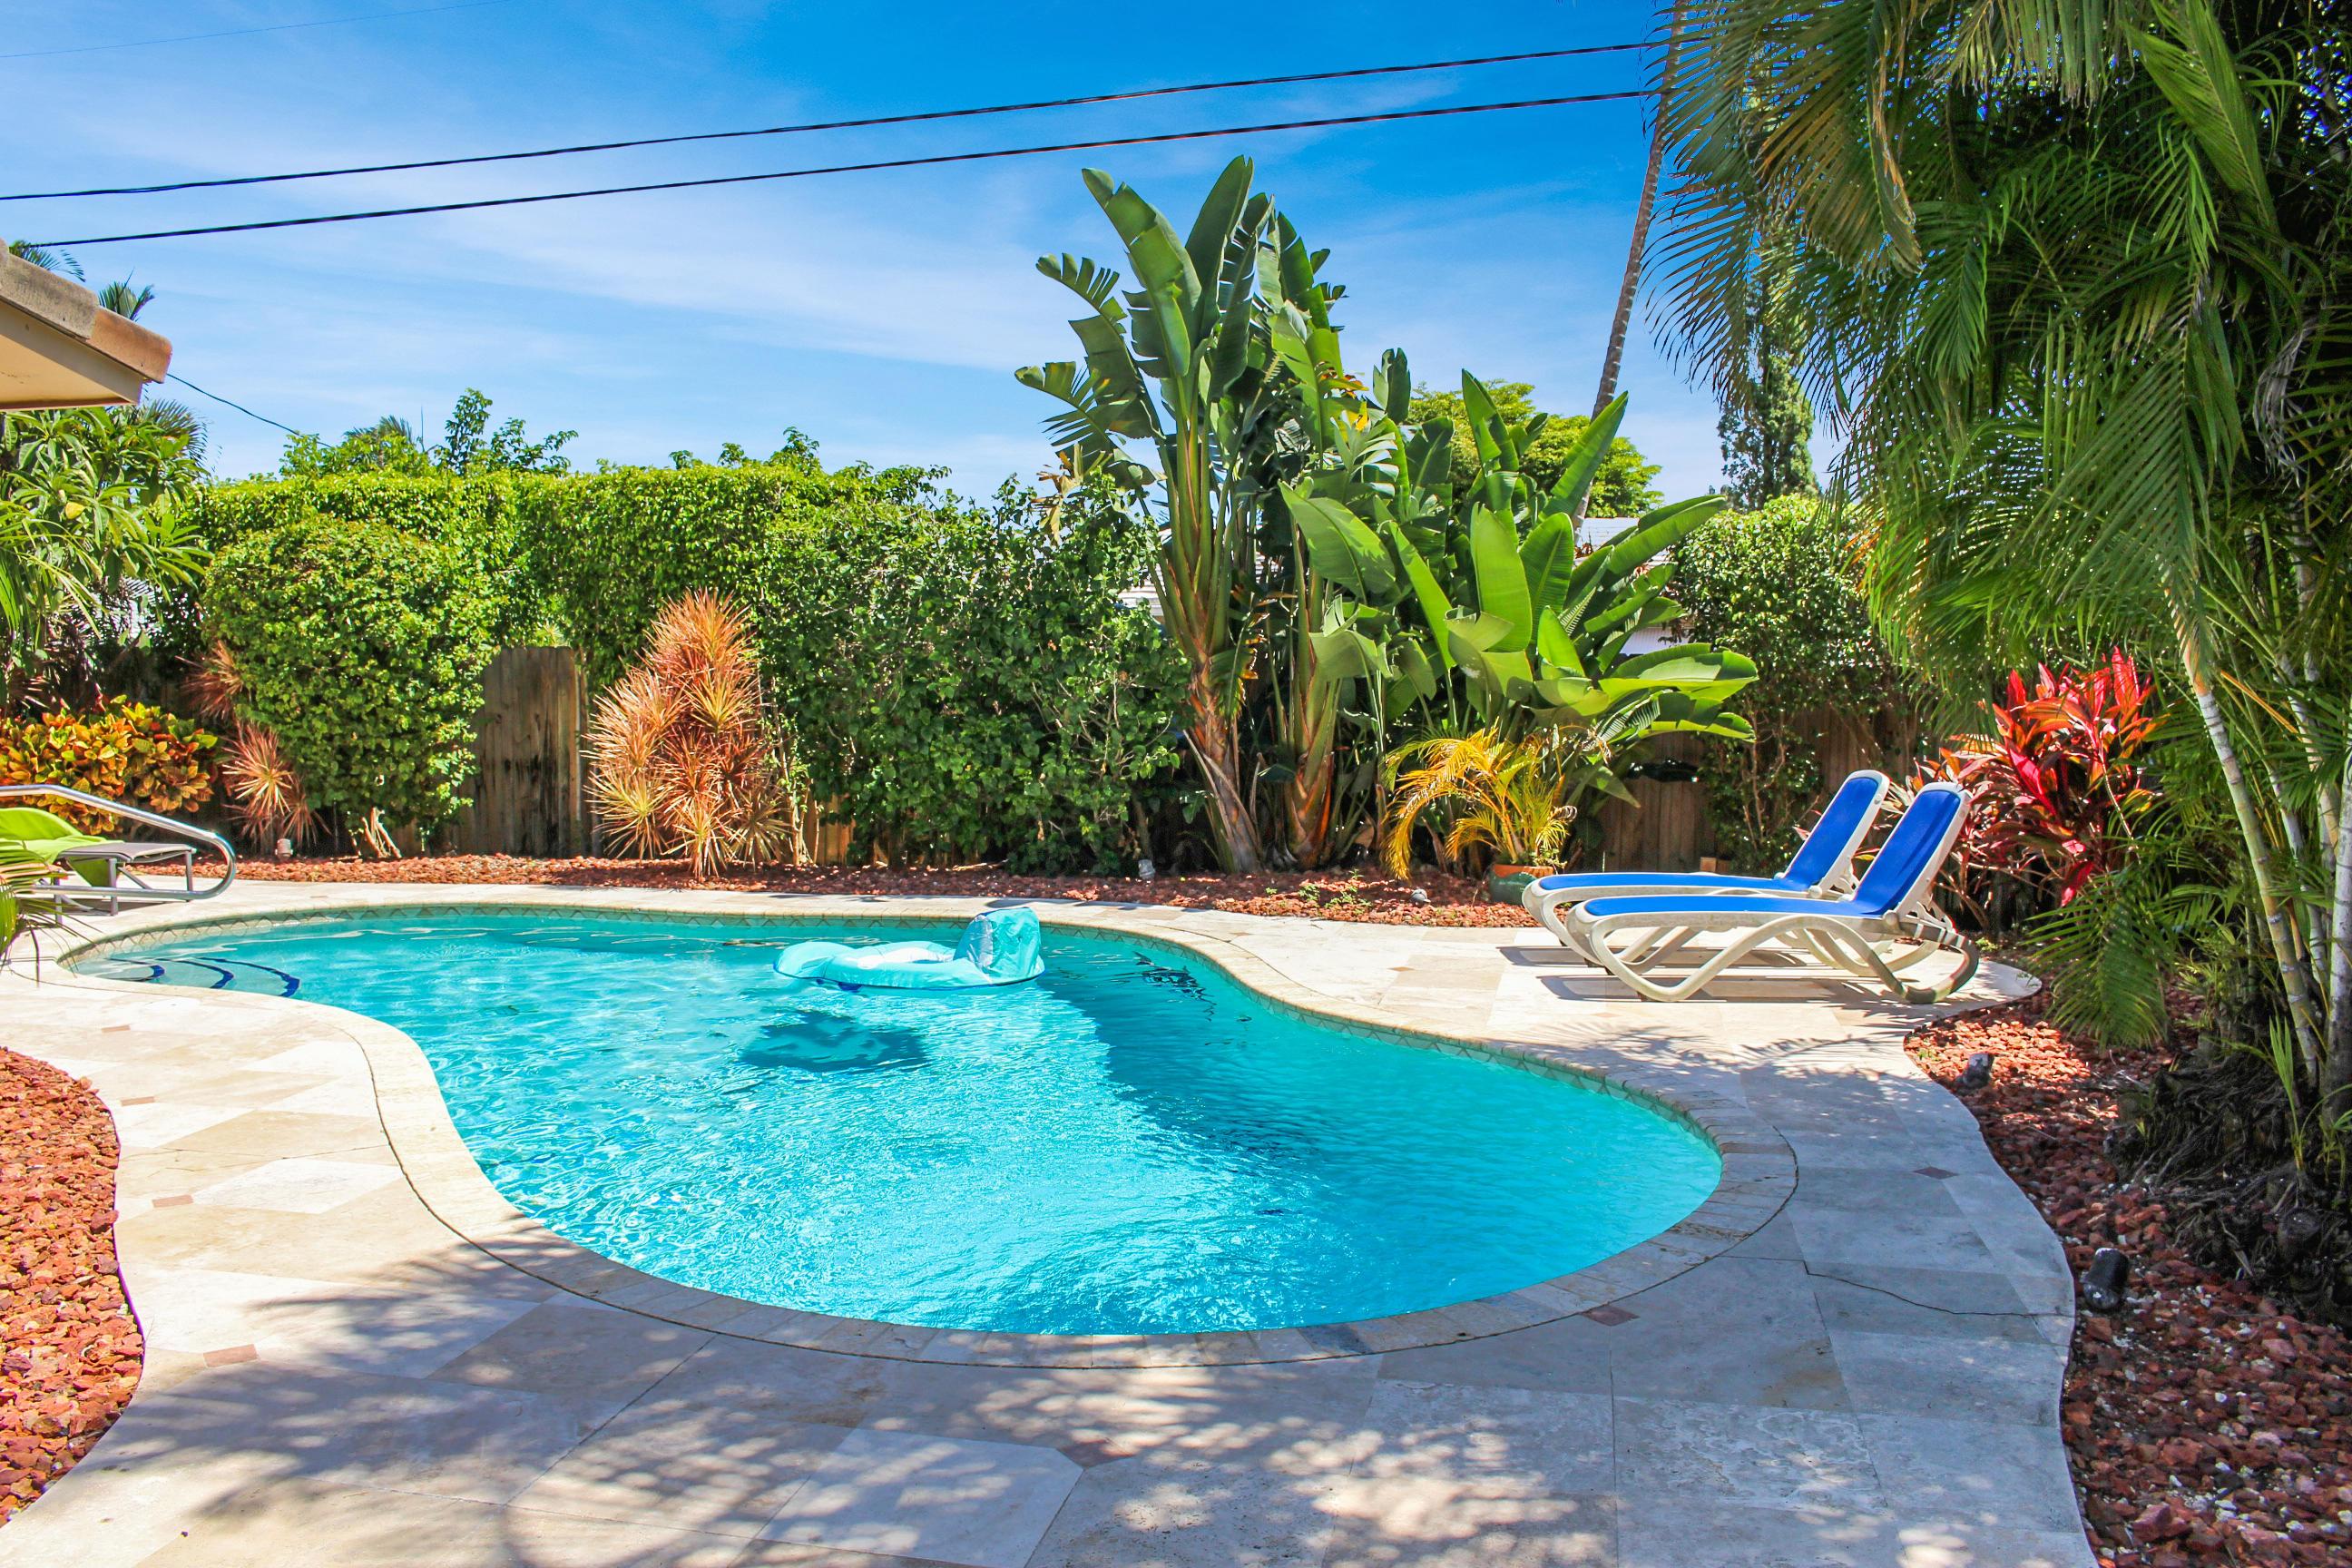 4072 Nw 2nd Terrace Boca Raton, FL 33431